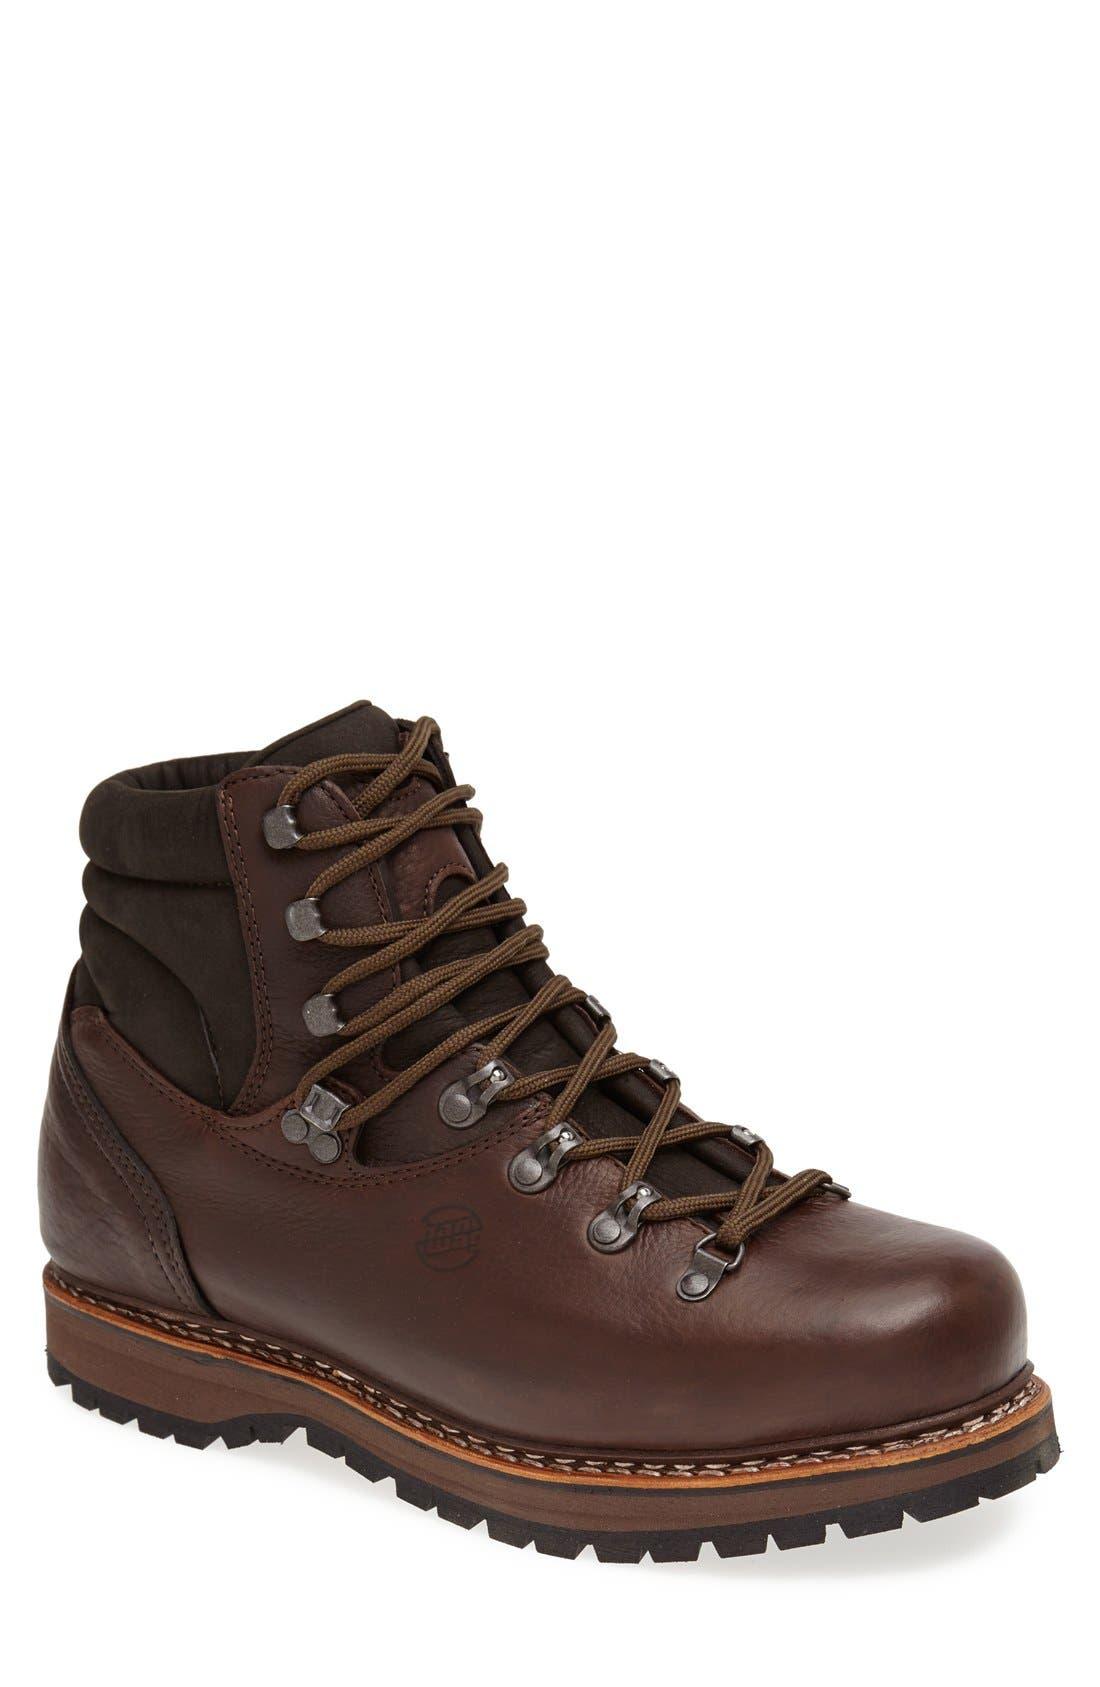 'Tashi' Hiking Boot, Main, color, 202